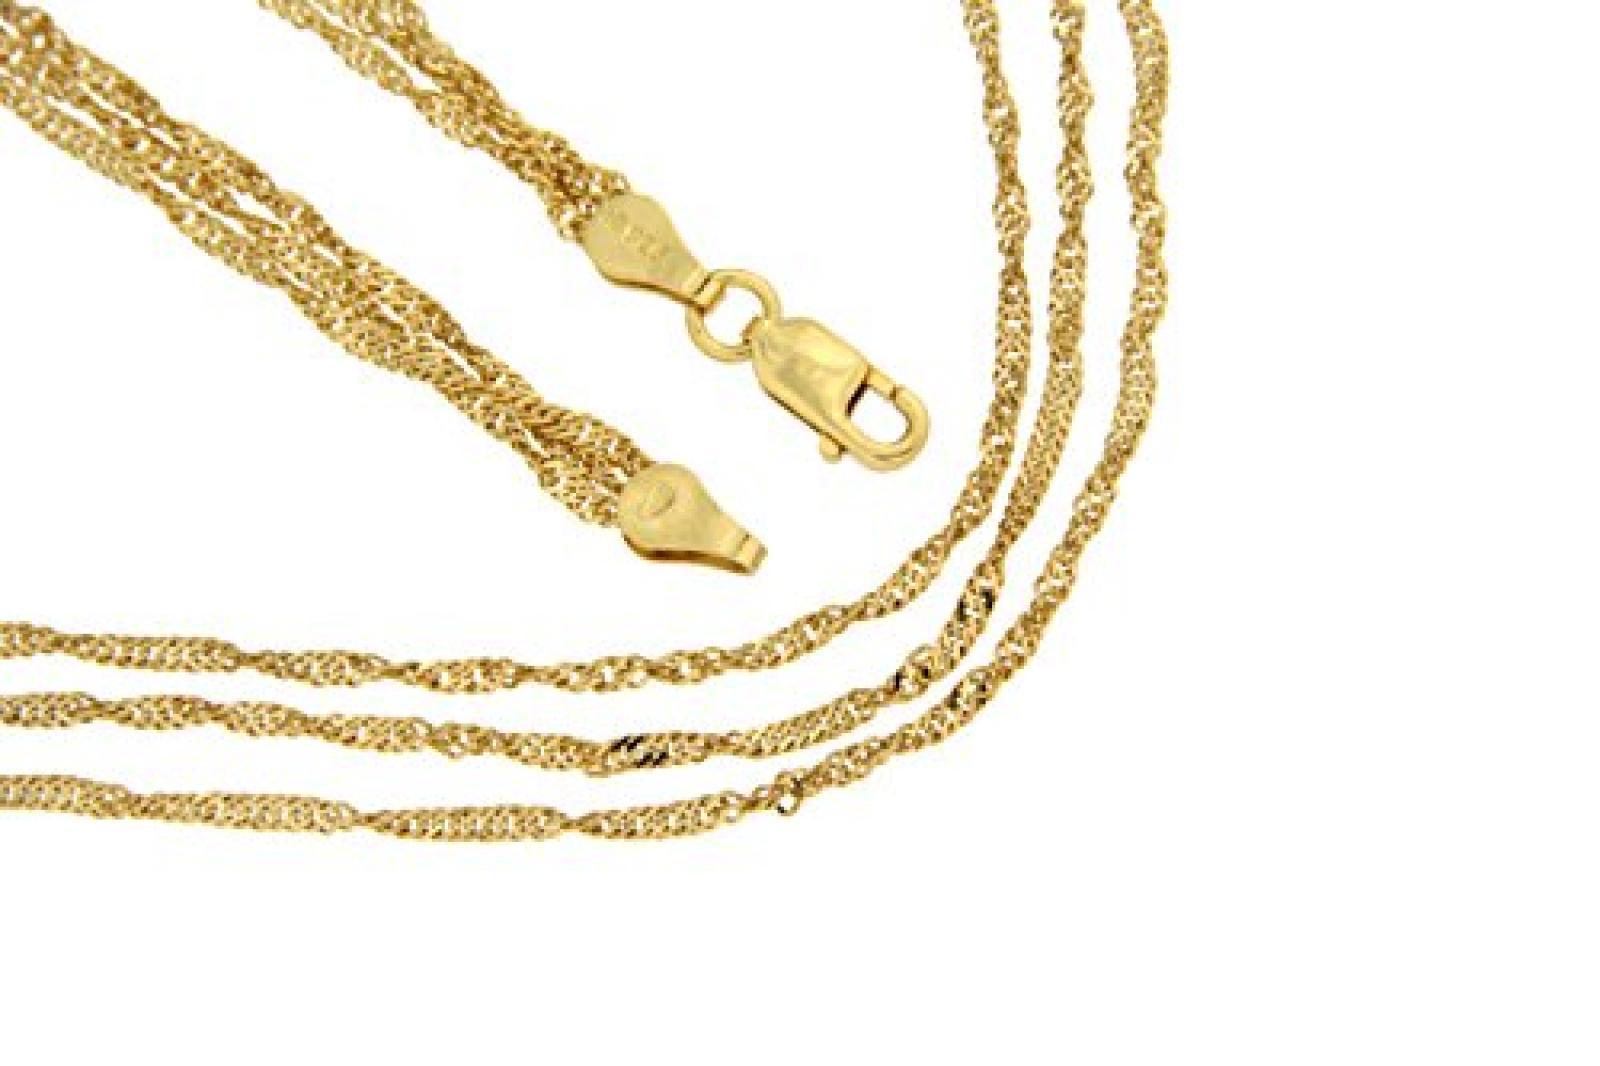 Kettenworld Damen Halskette 925 Sterling Silber 319865